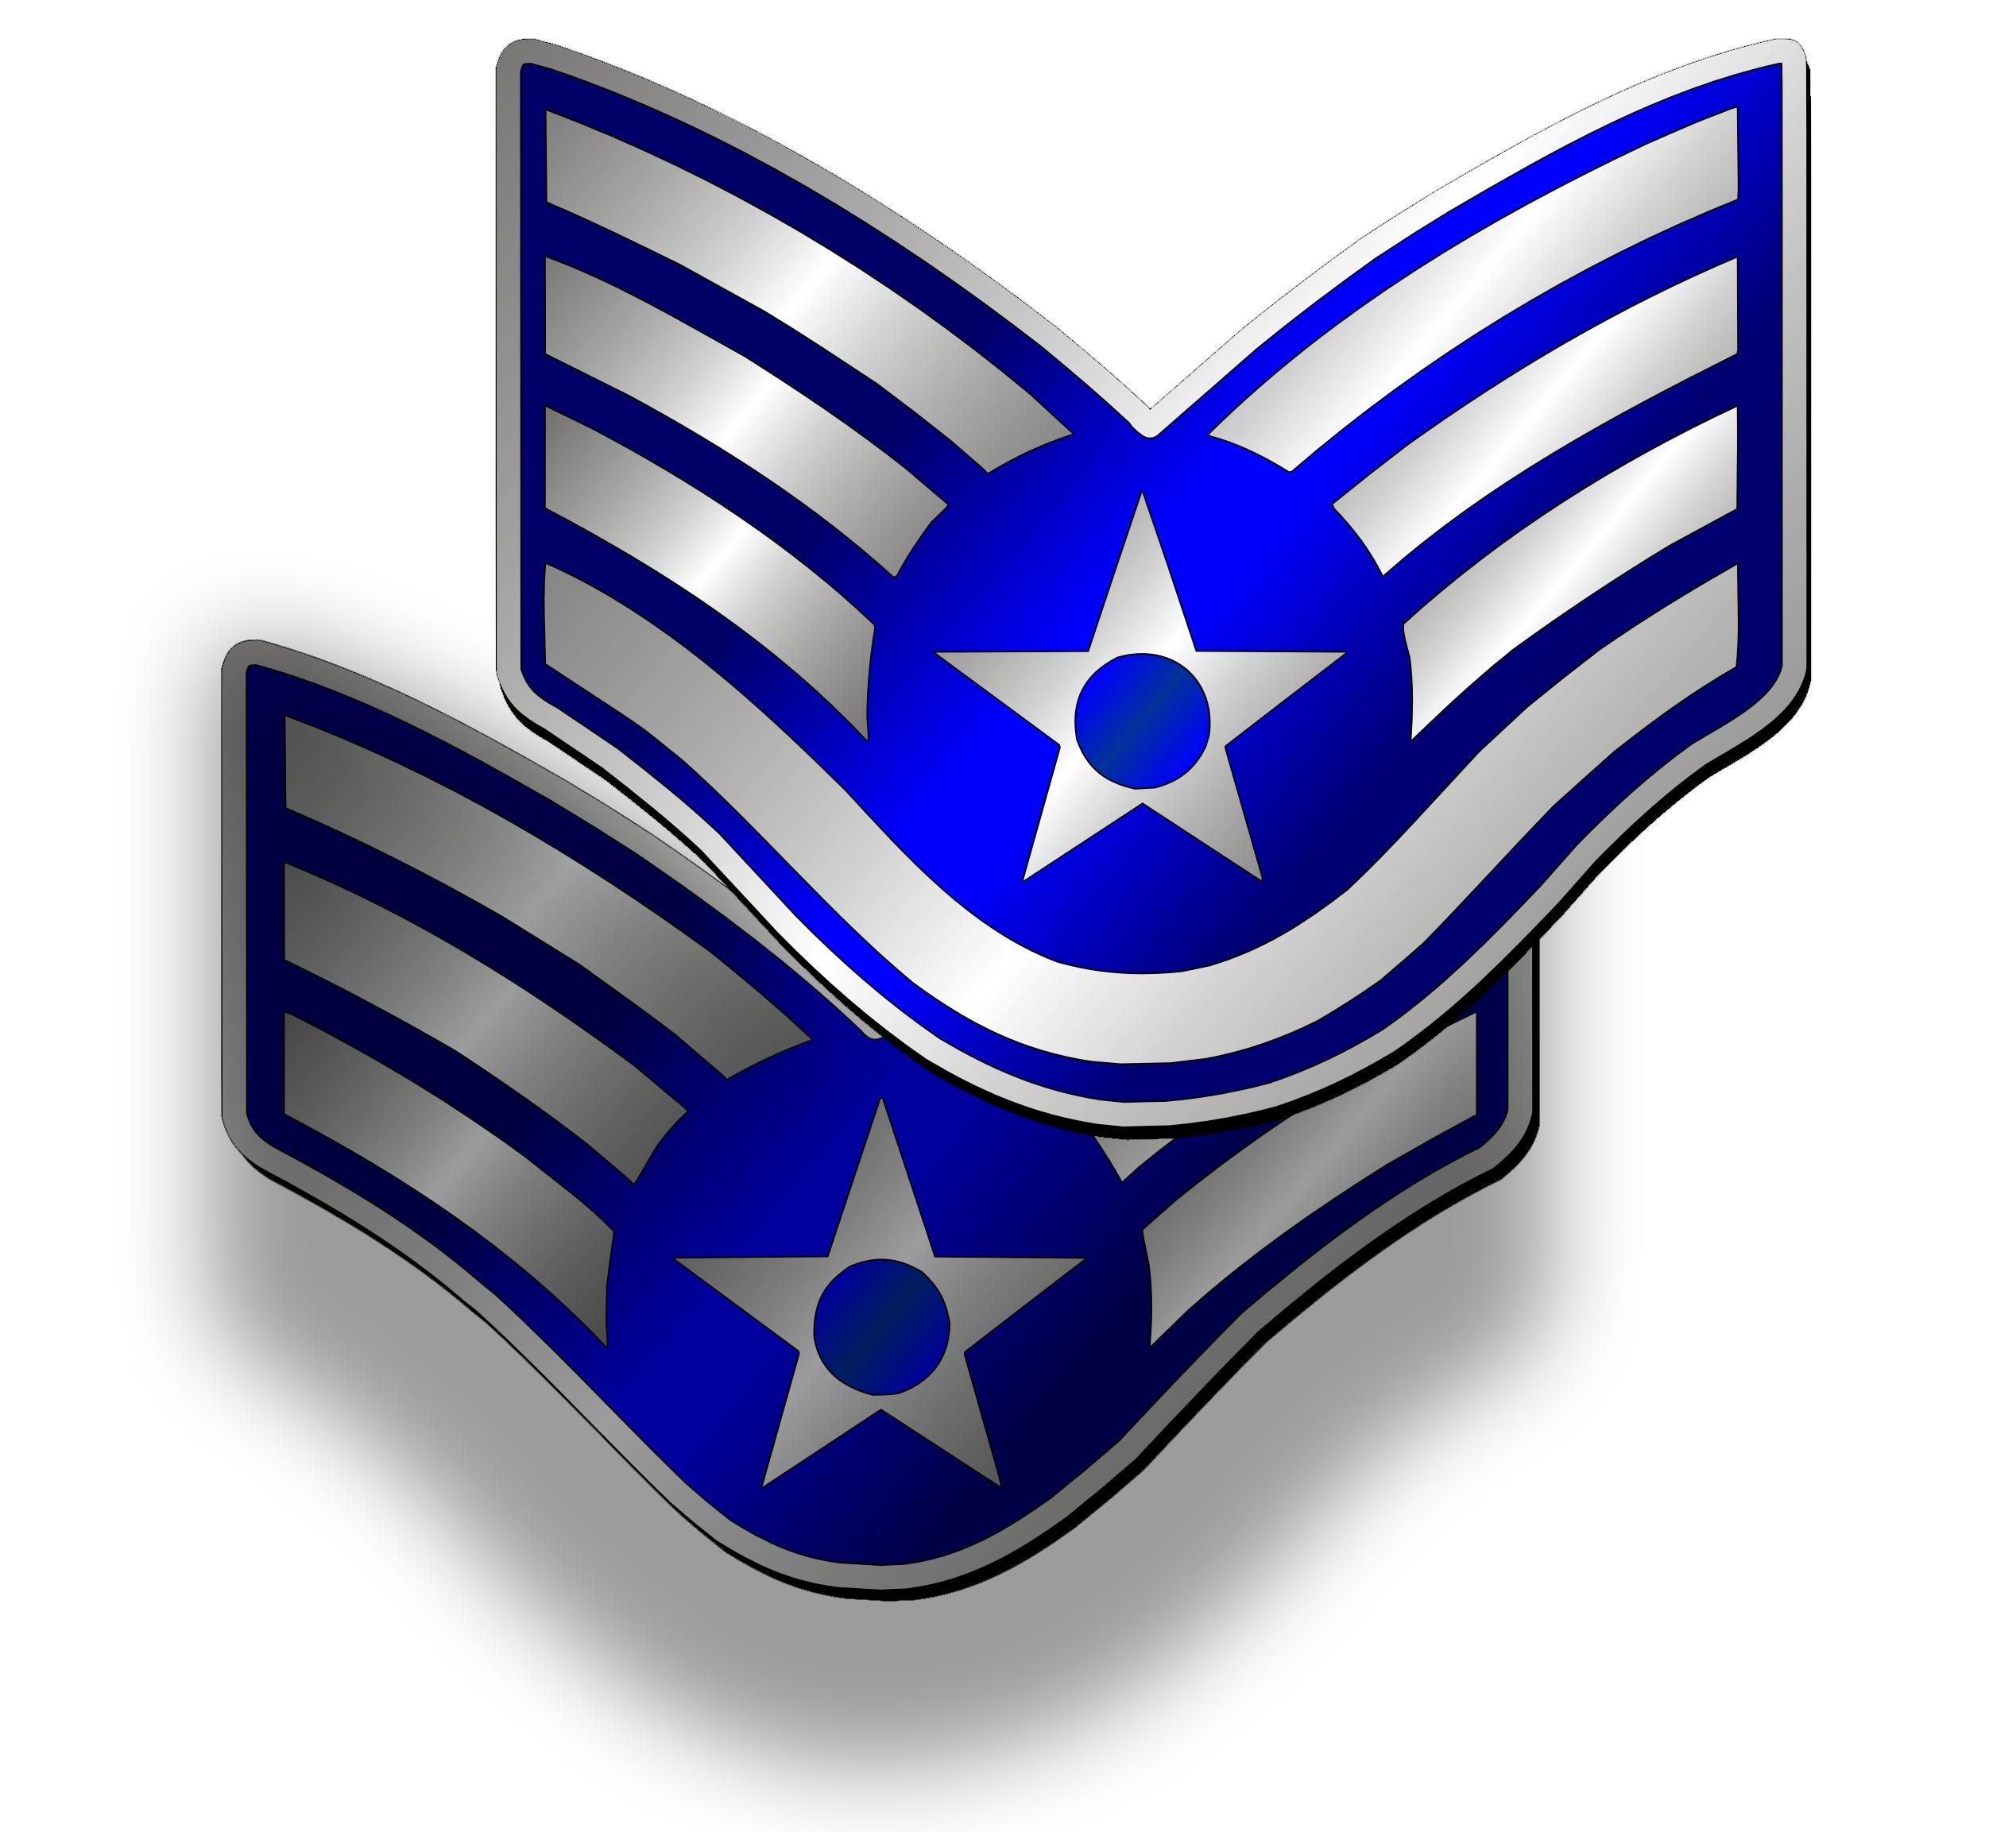 Senior airman date of rank calculator